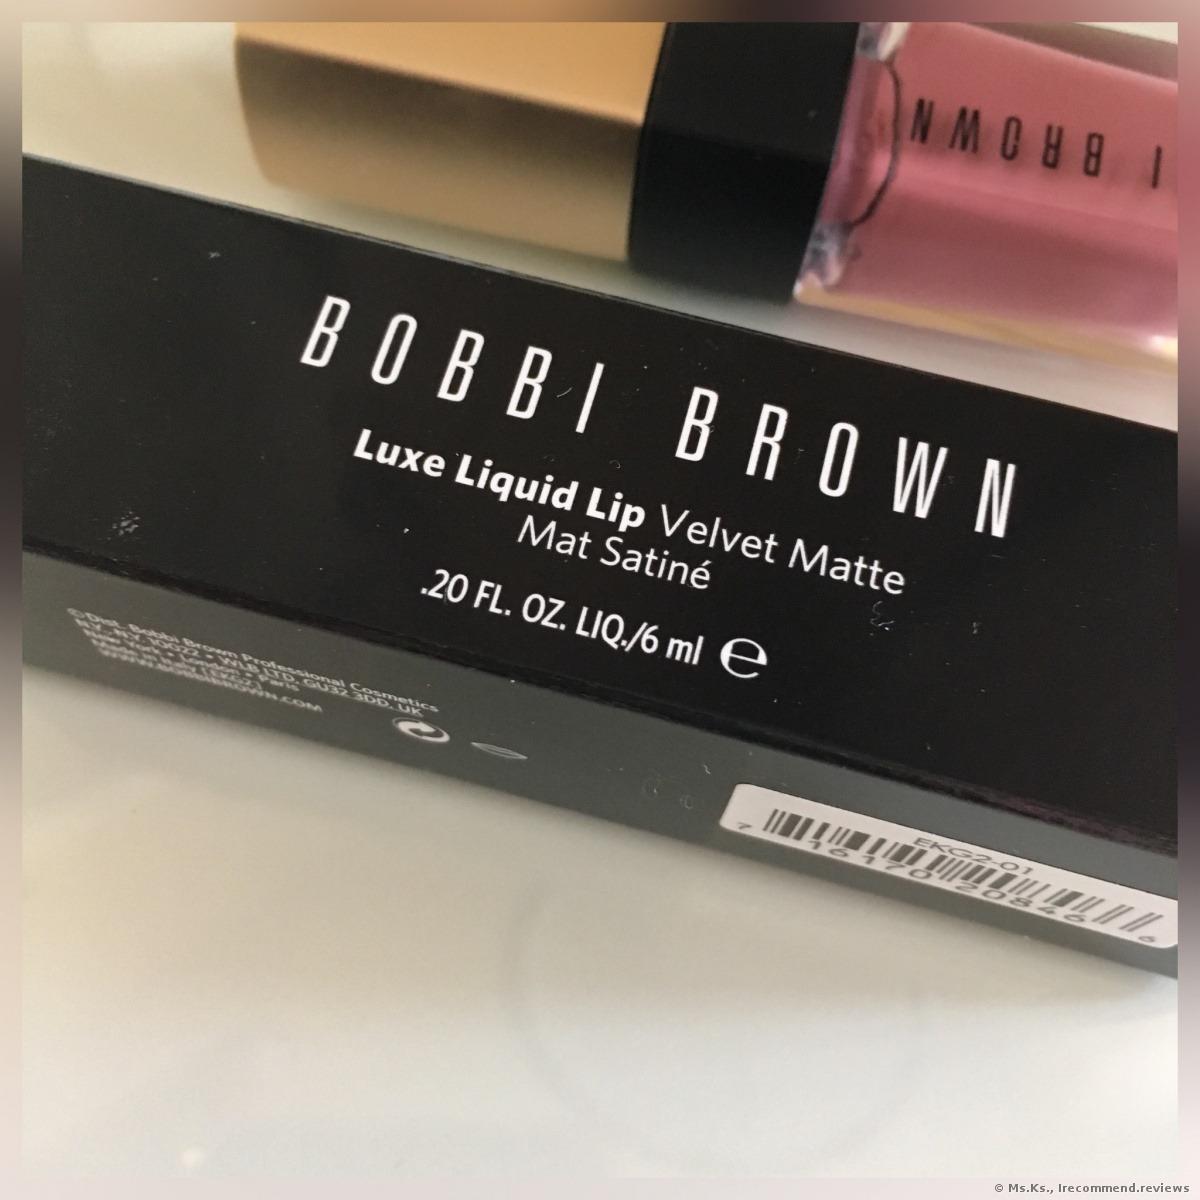 Bobbi Brown Luxe Liquid Lip Velvet Matte Lipstick Shades Double